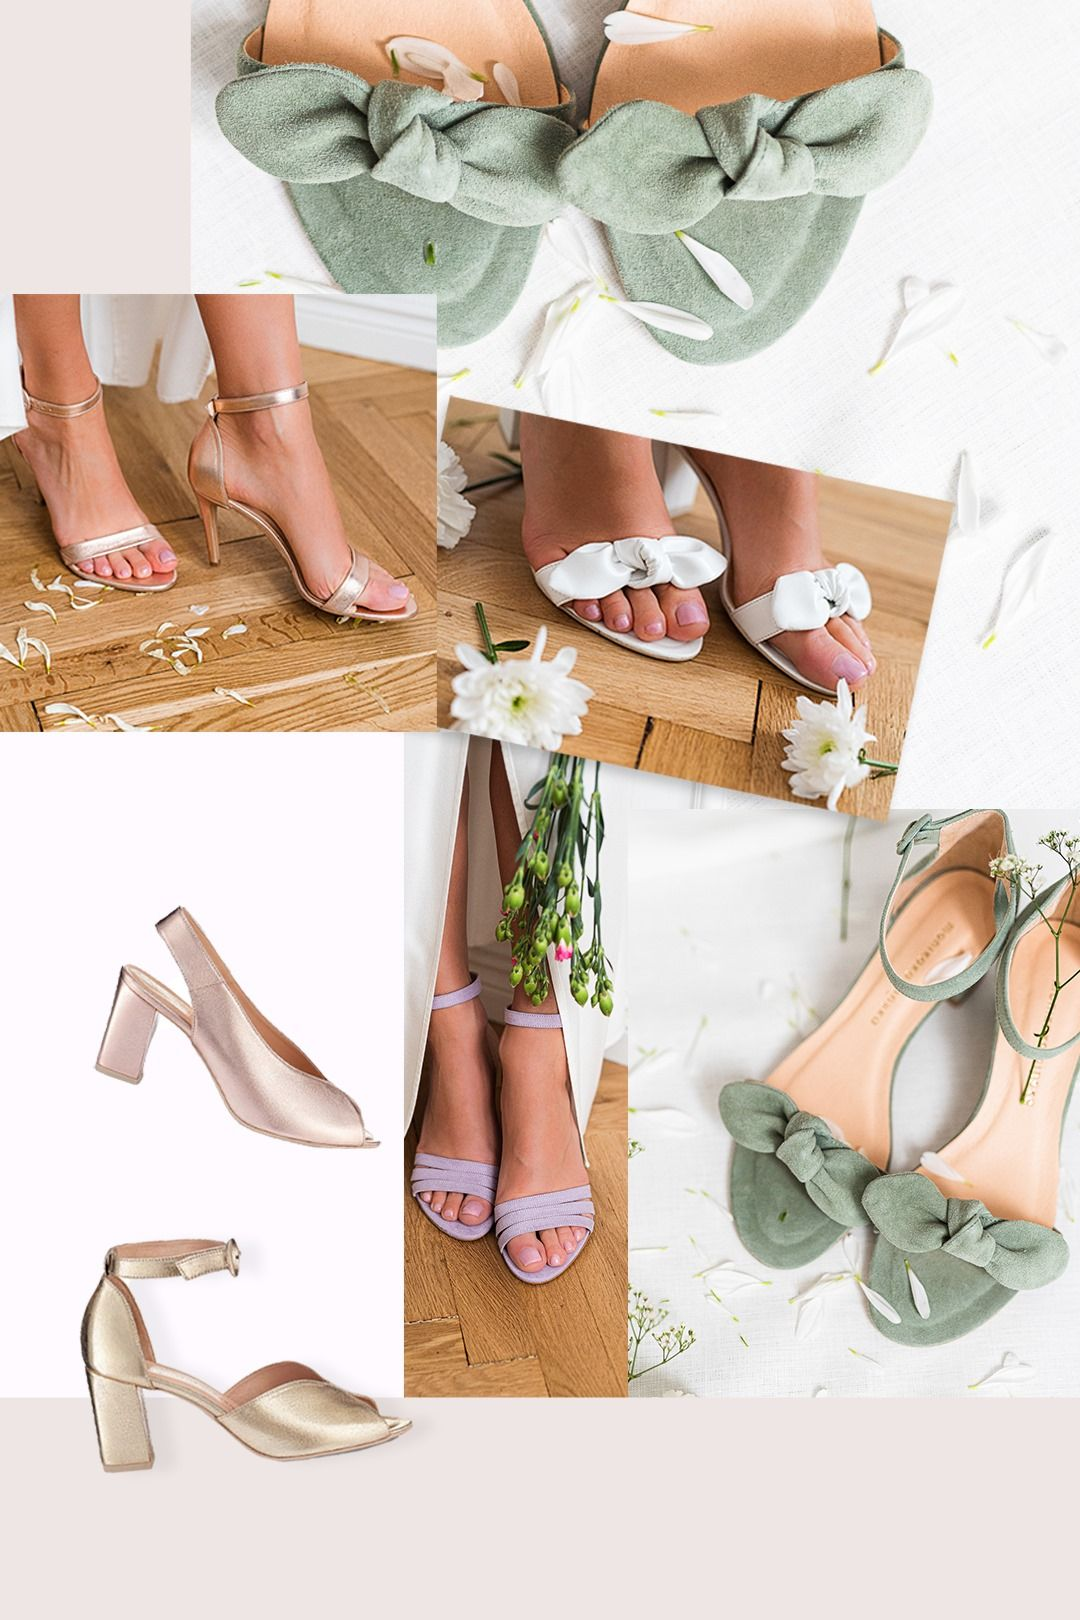 Jak Wybrac Buty Slubne Wedding Dresses Shoes Dresses